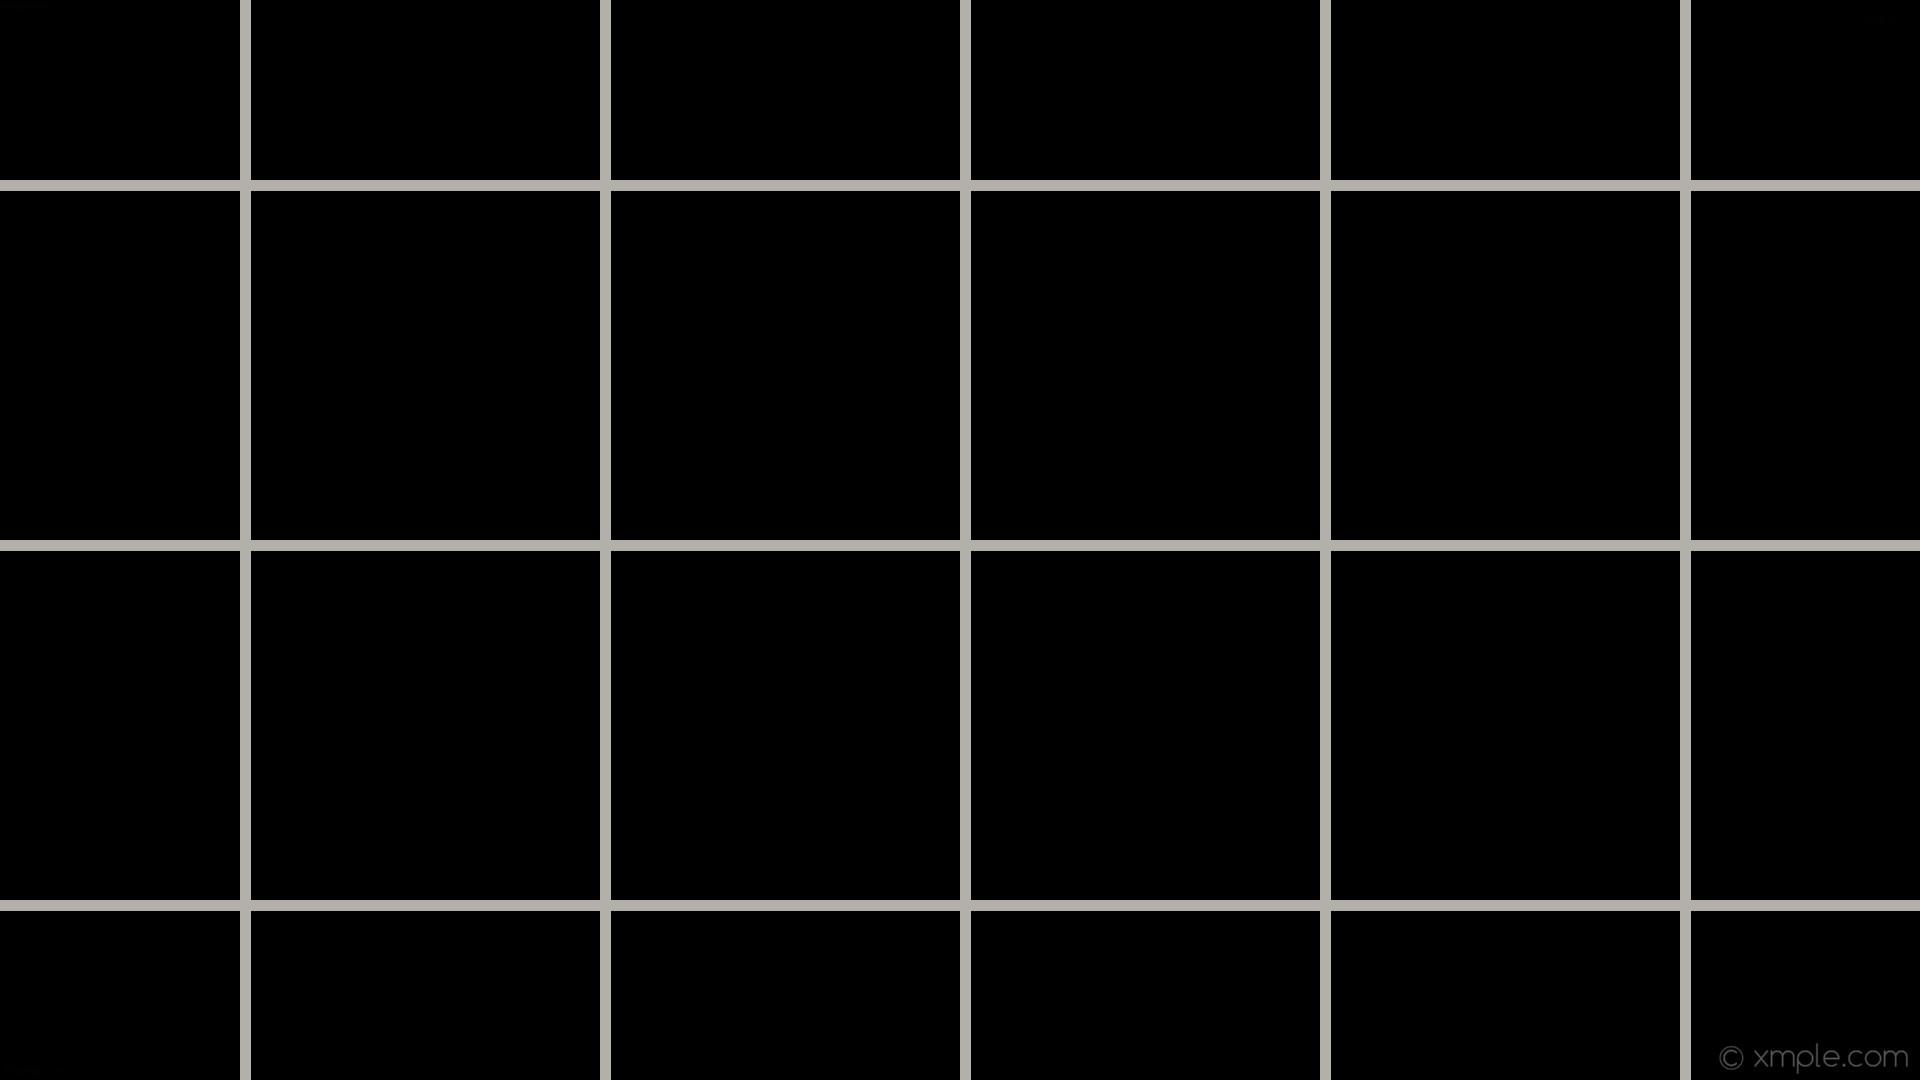 Res: 1920x1080, wallpaper graph paper white black grid floral white #000000 #fffaf0 0° 11px  360px